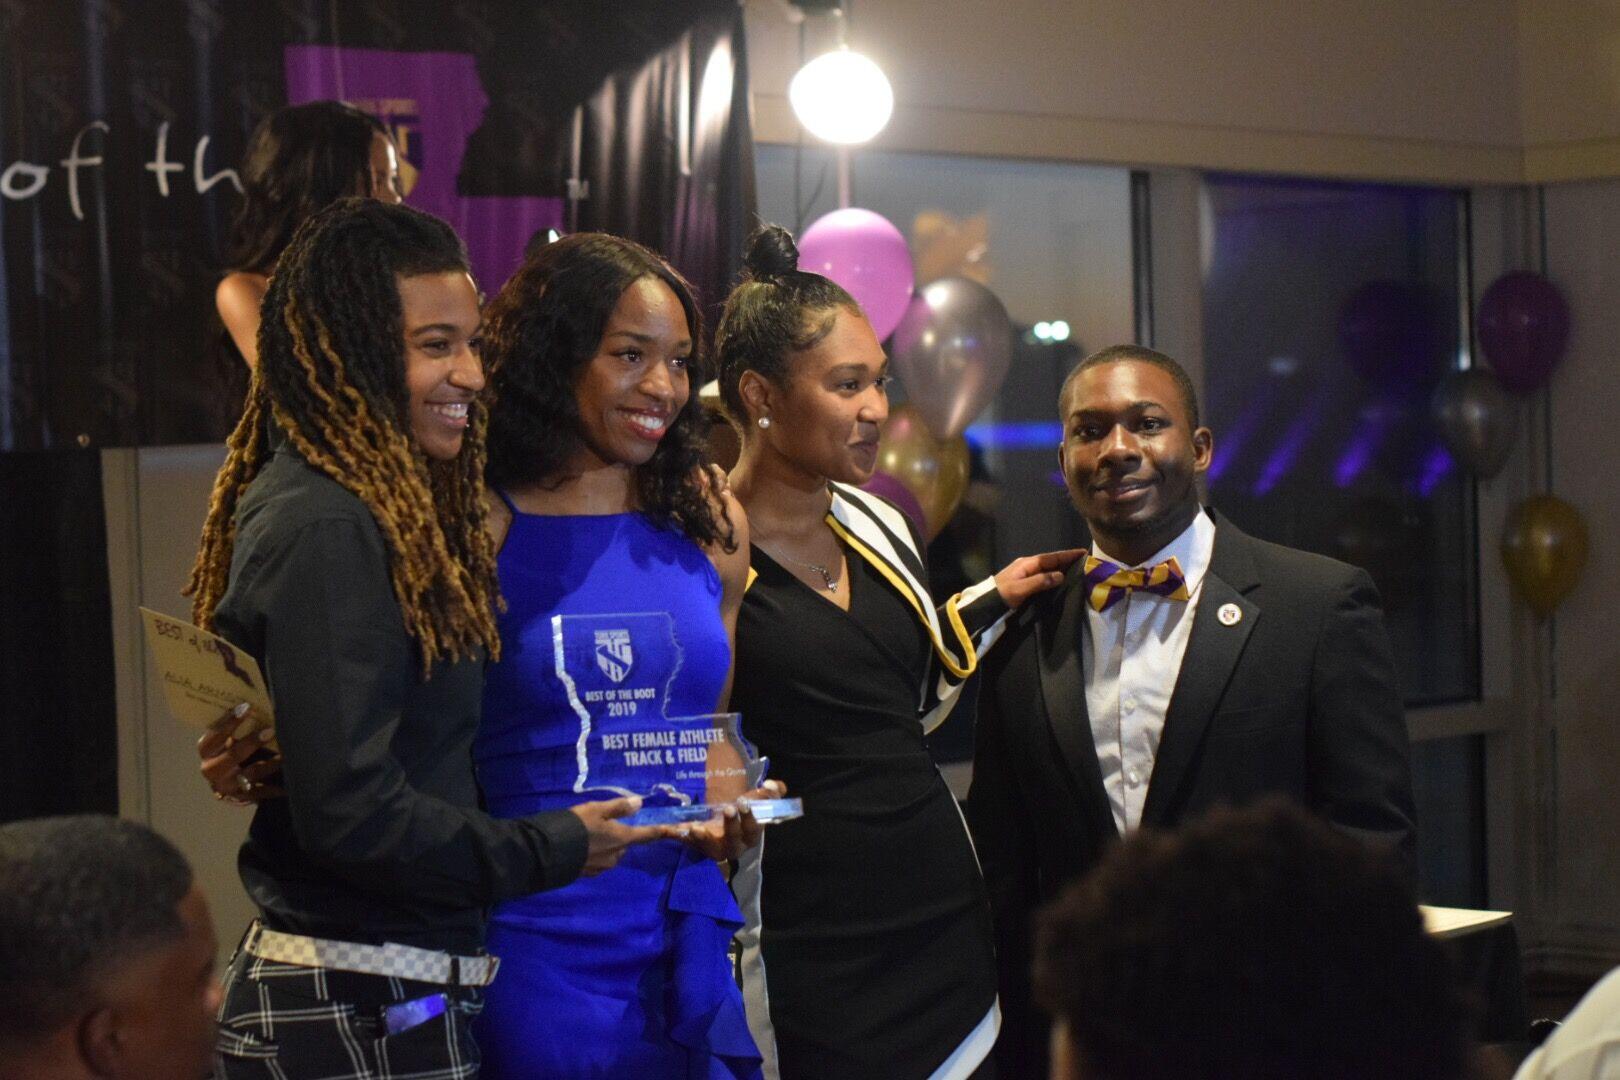 Alia Armstrong- Best Female Athlete; Track & Field receives award from Pro Track Star Aliah Hobbs, presenter Amaya Cannon & Lance Jones